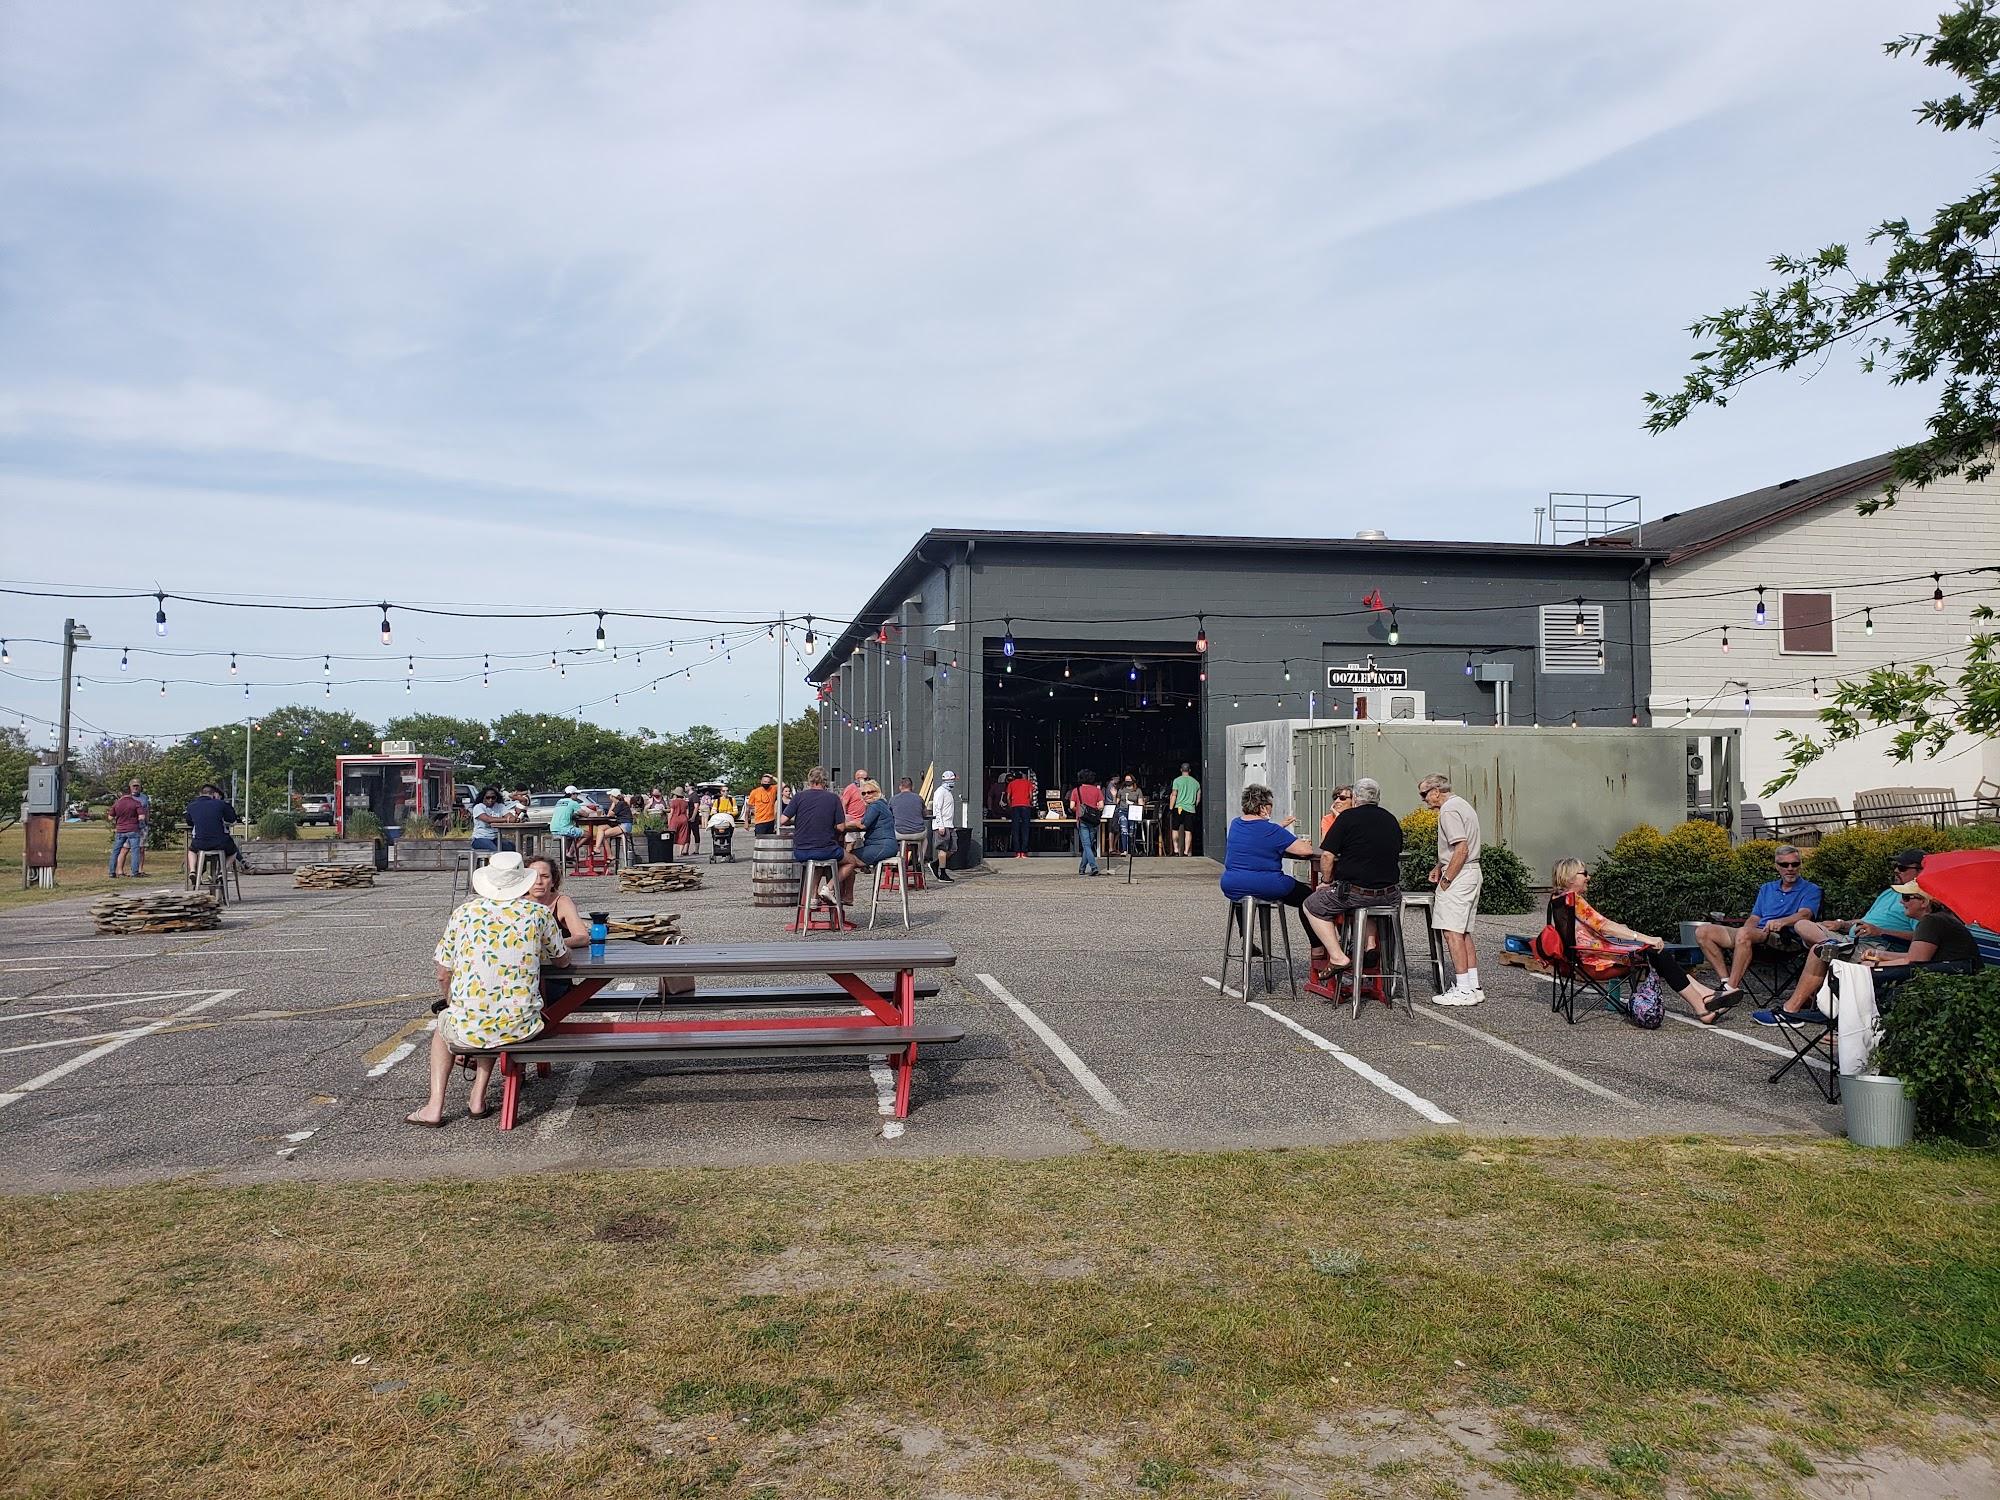 Oozlefinch Beers & Blending 81 Patch Rd, Fort Monroe